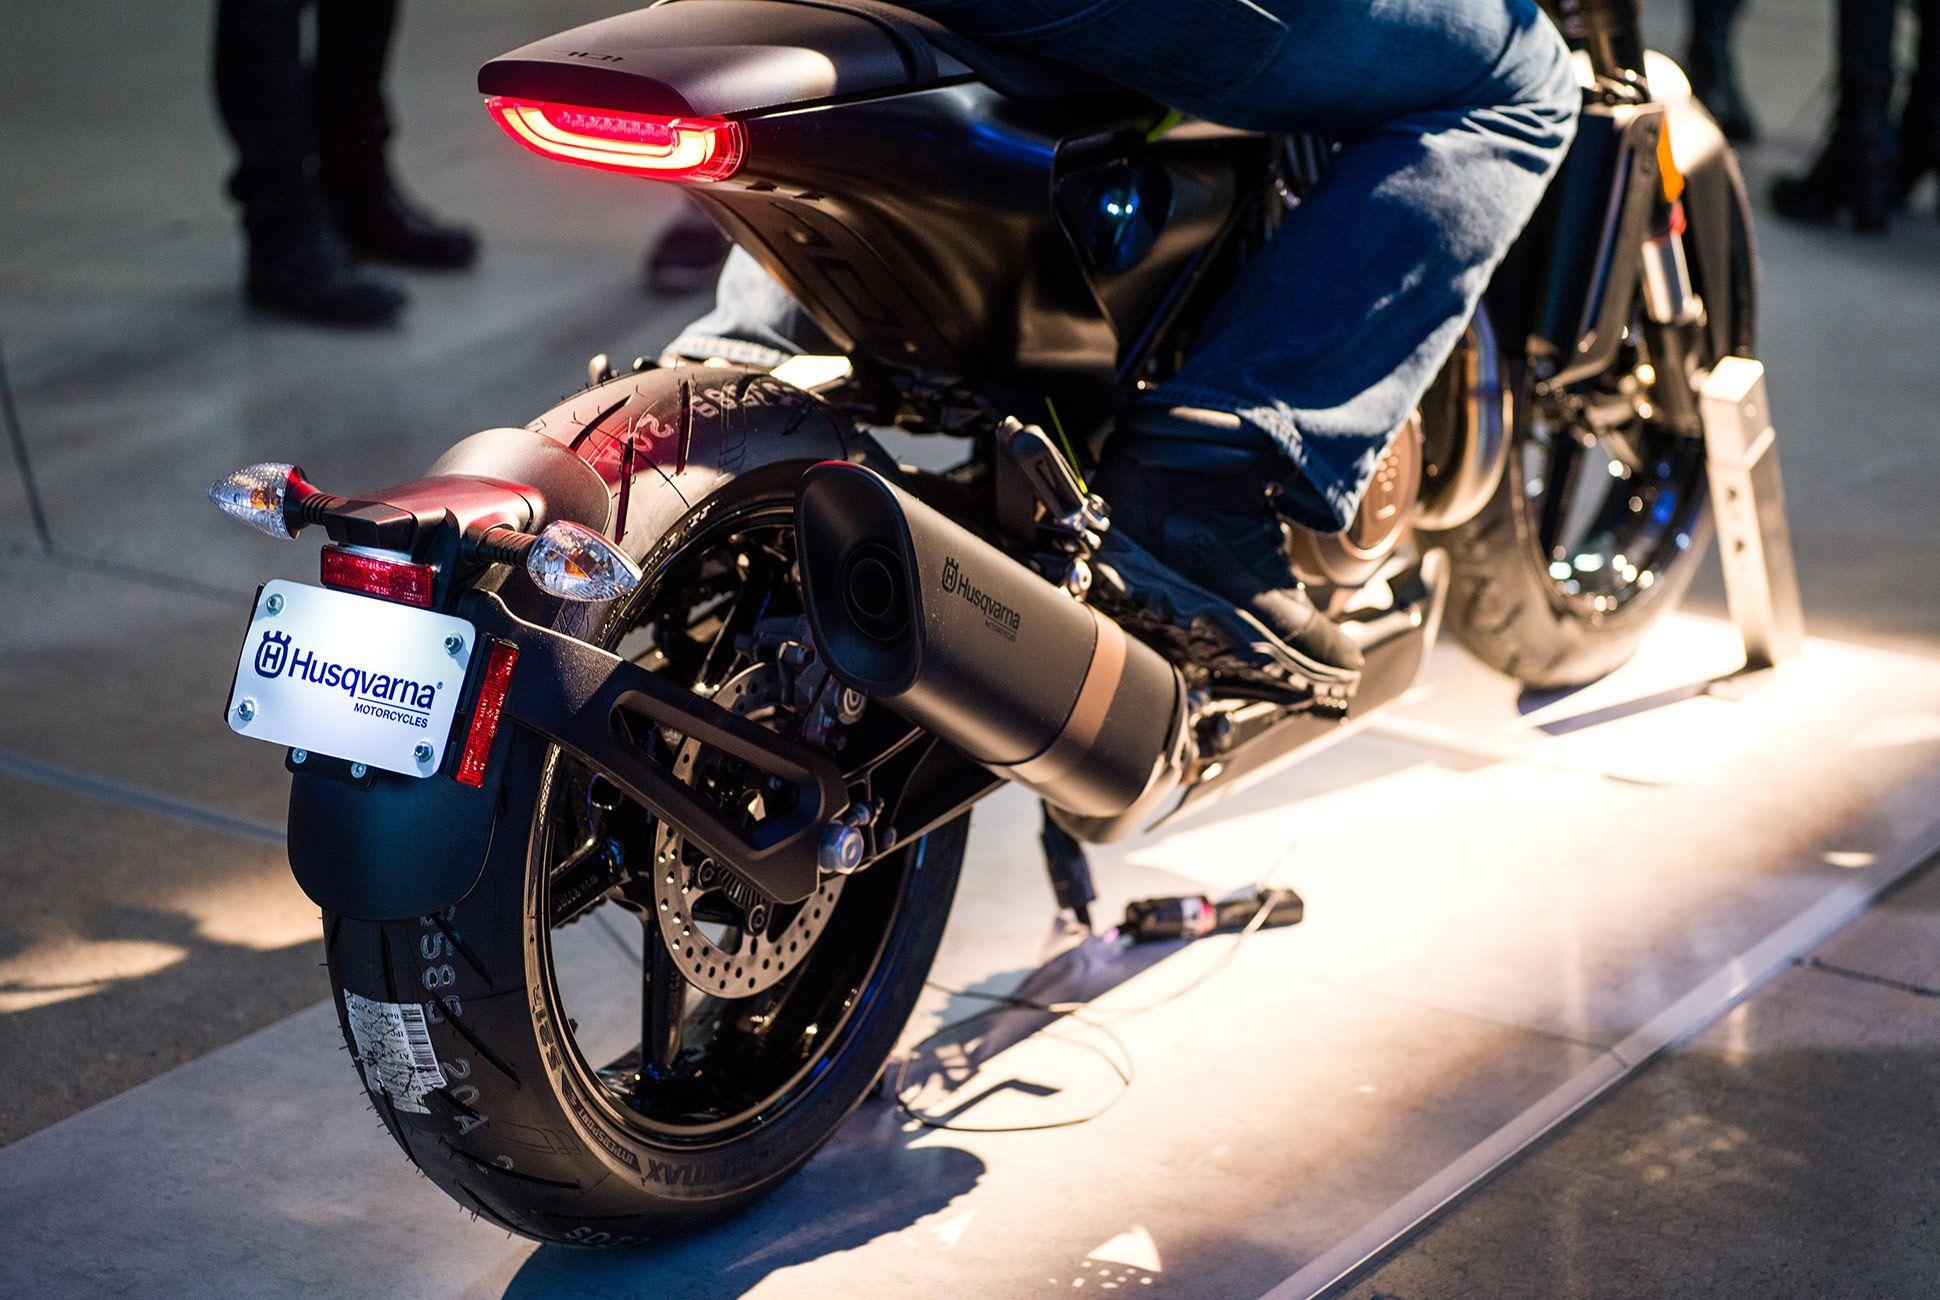 Husqvarna-Motorcycle-gear-patrol-8